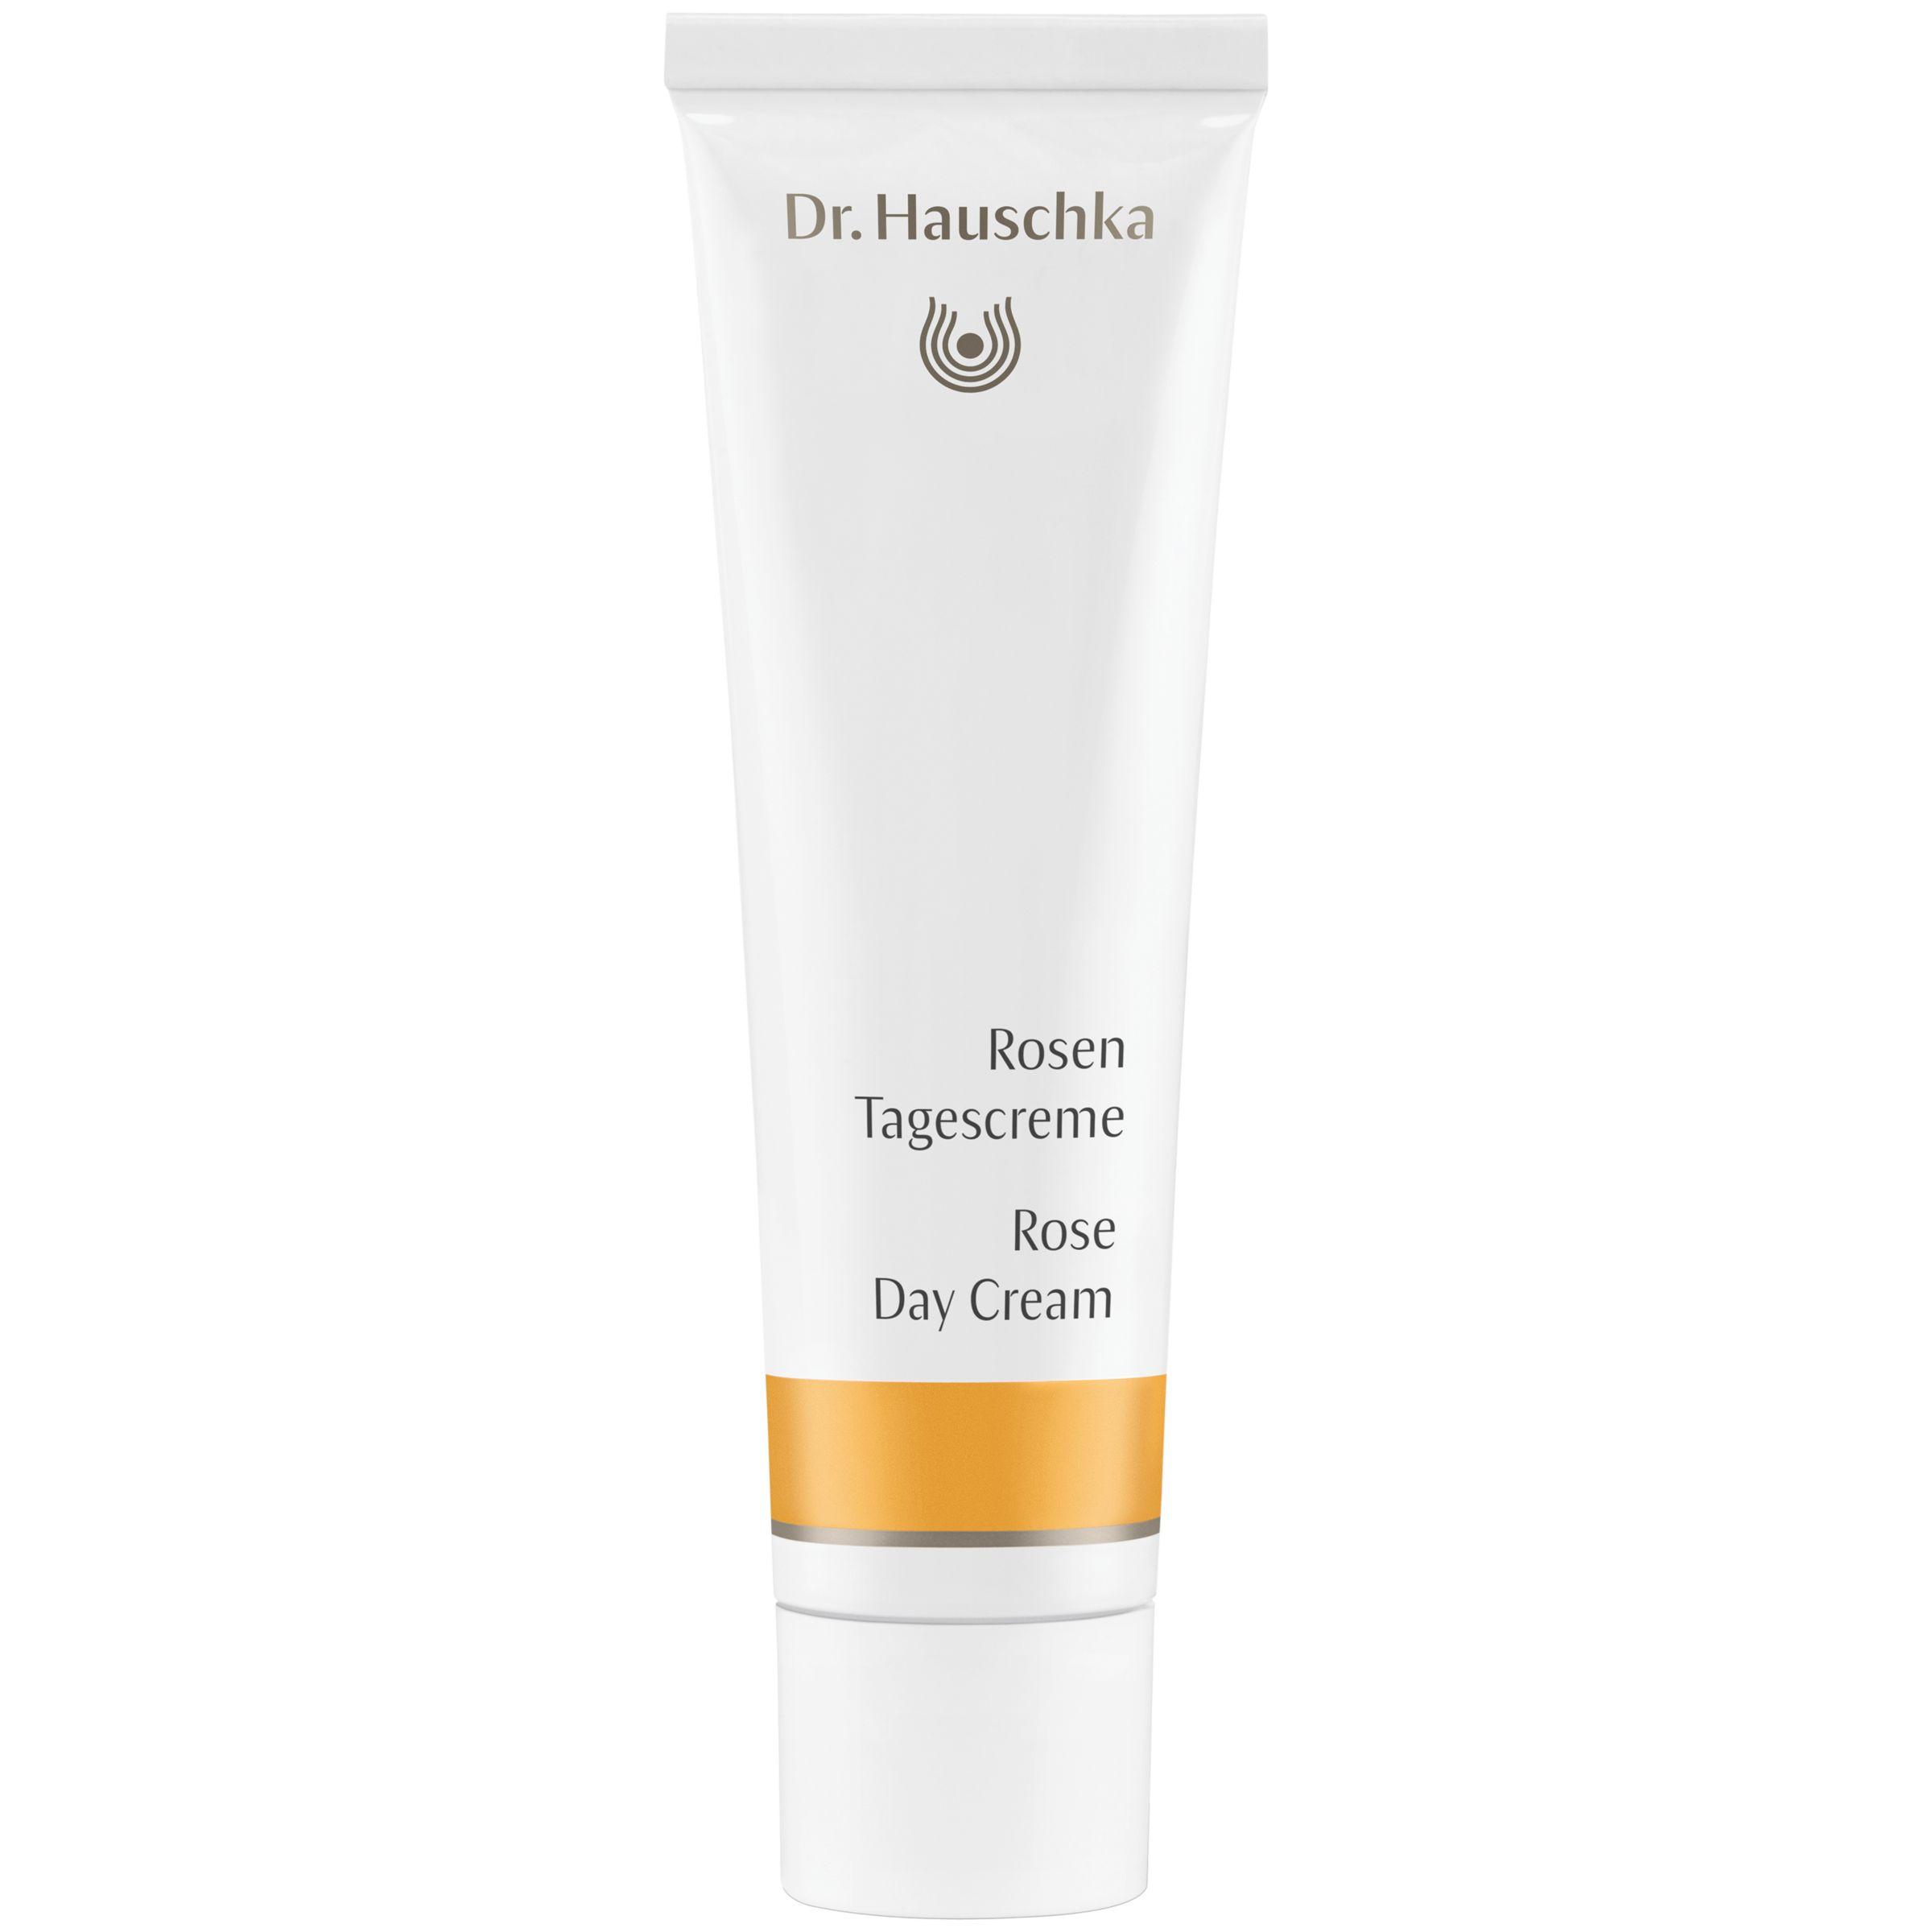 Dr Hauschka Dr Hauschka Rose Day Cream, 30ml